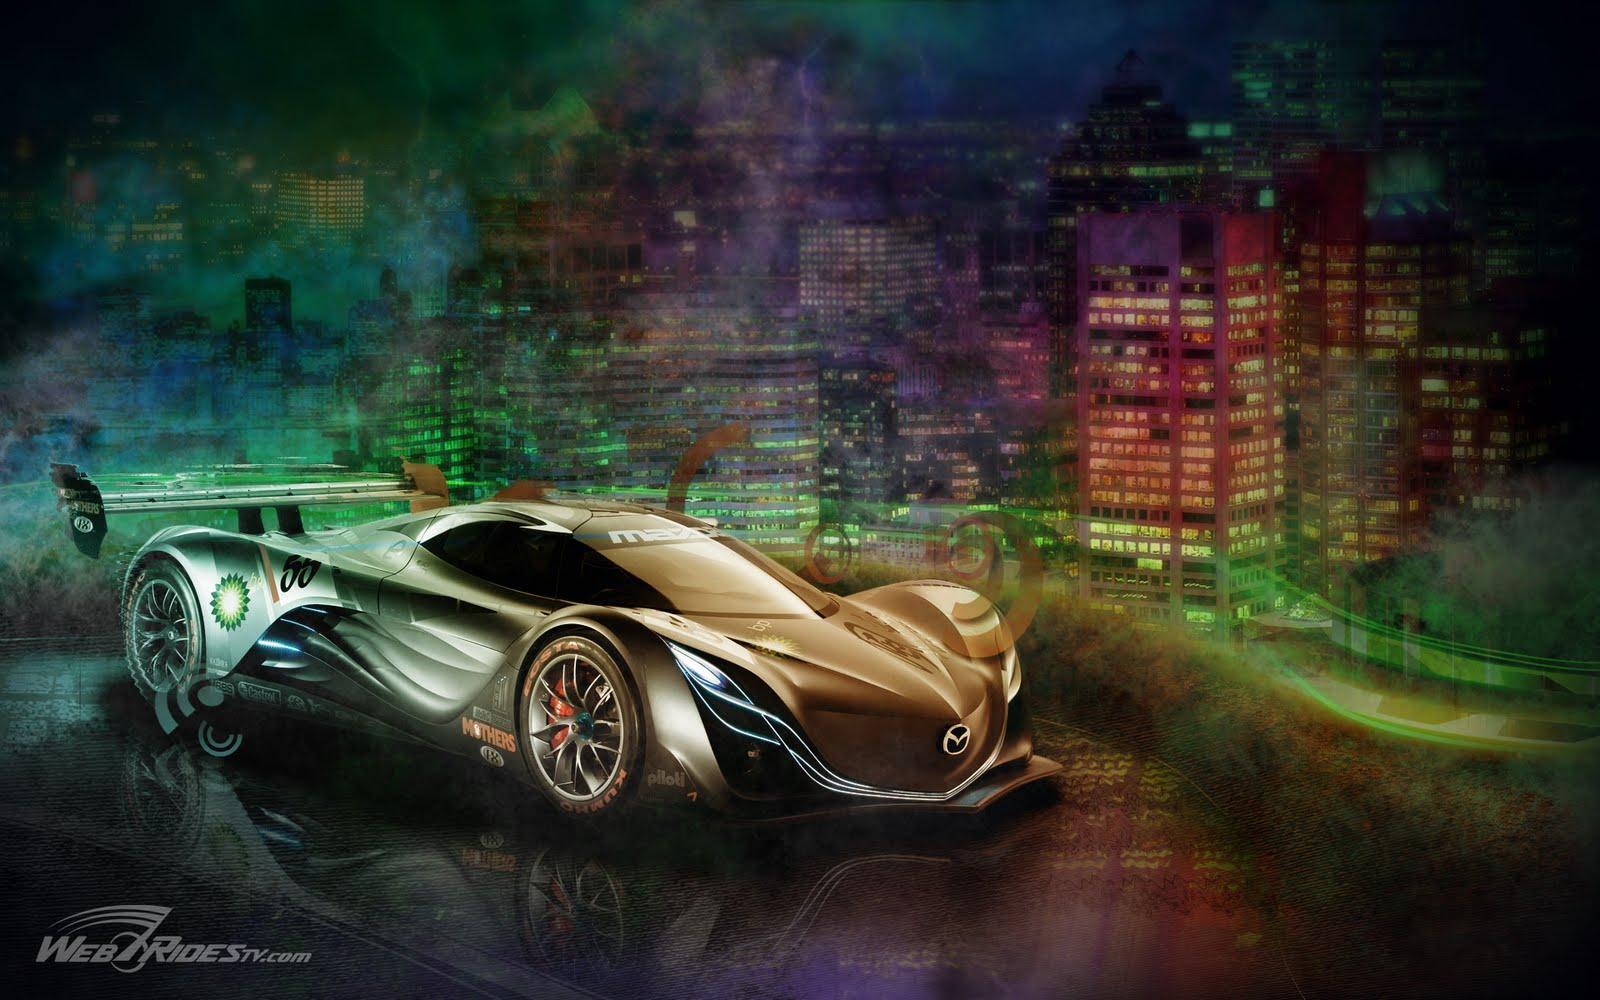 http://3.bp.blogspot.com/-pizBNl-3X8A/TaATJ_xN7cI/AAAAAAAAATw/r0Og7GqiuU4/s1600/Mazda_Furai_concept_hd_wallpaper_2.jpg